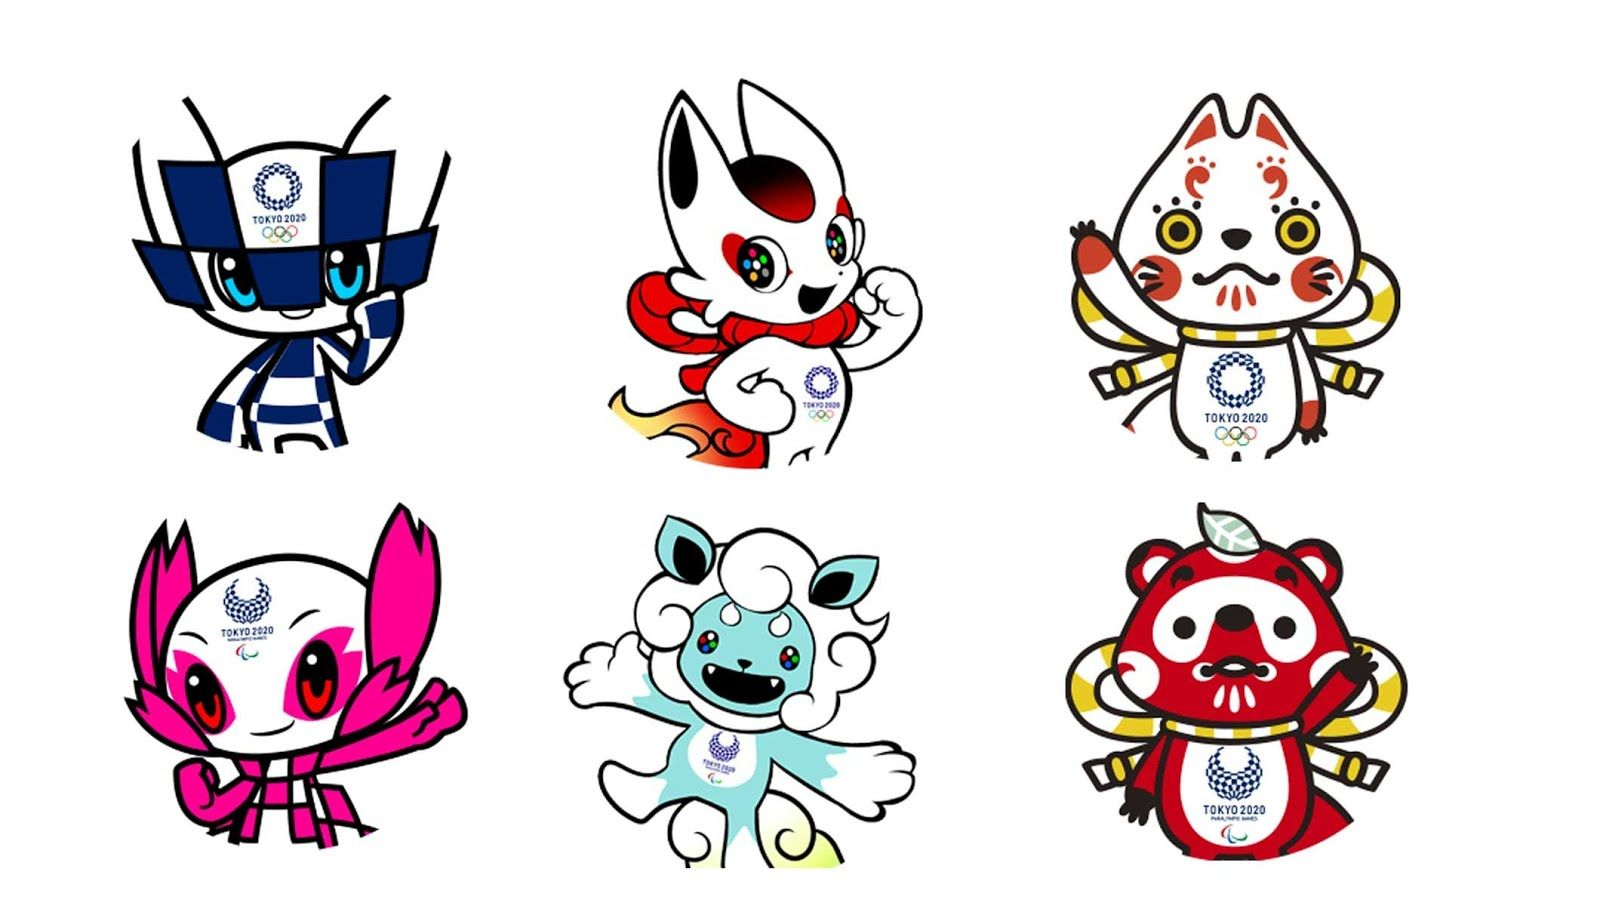 Japan It's A Wonderful Rife 2020 Tokyo Olympic Mascot